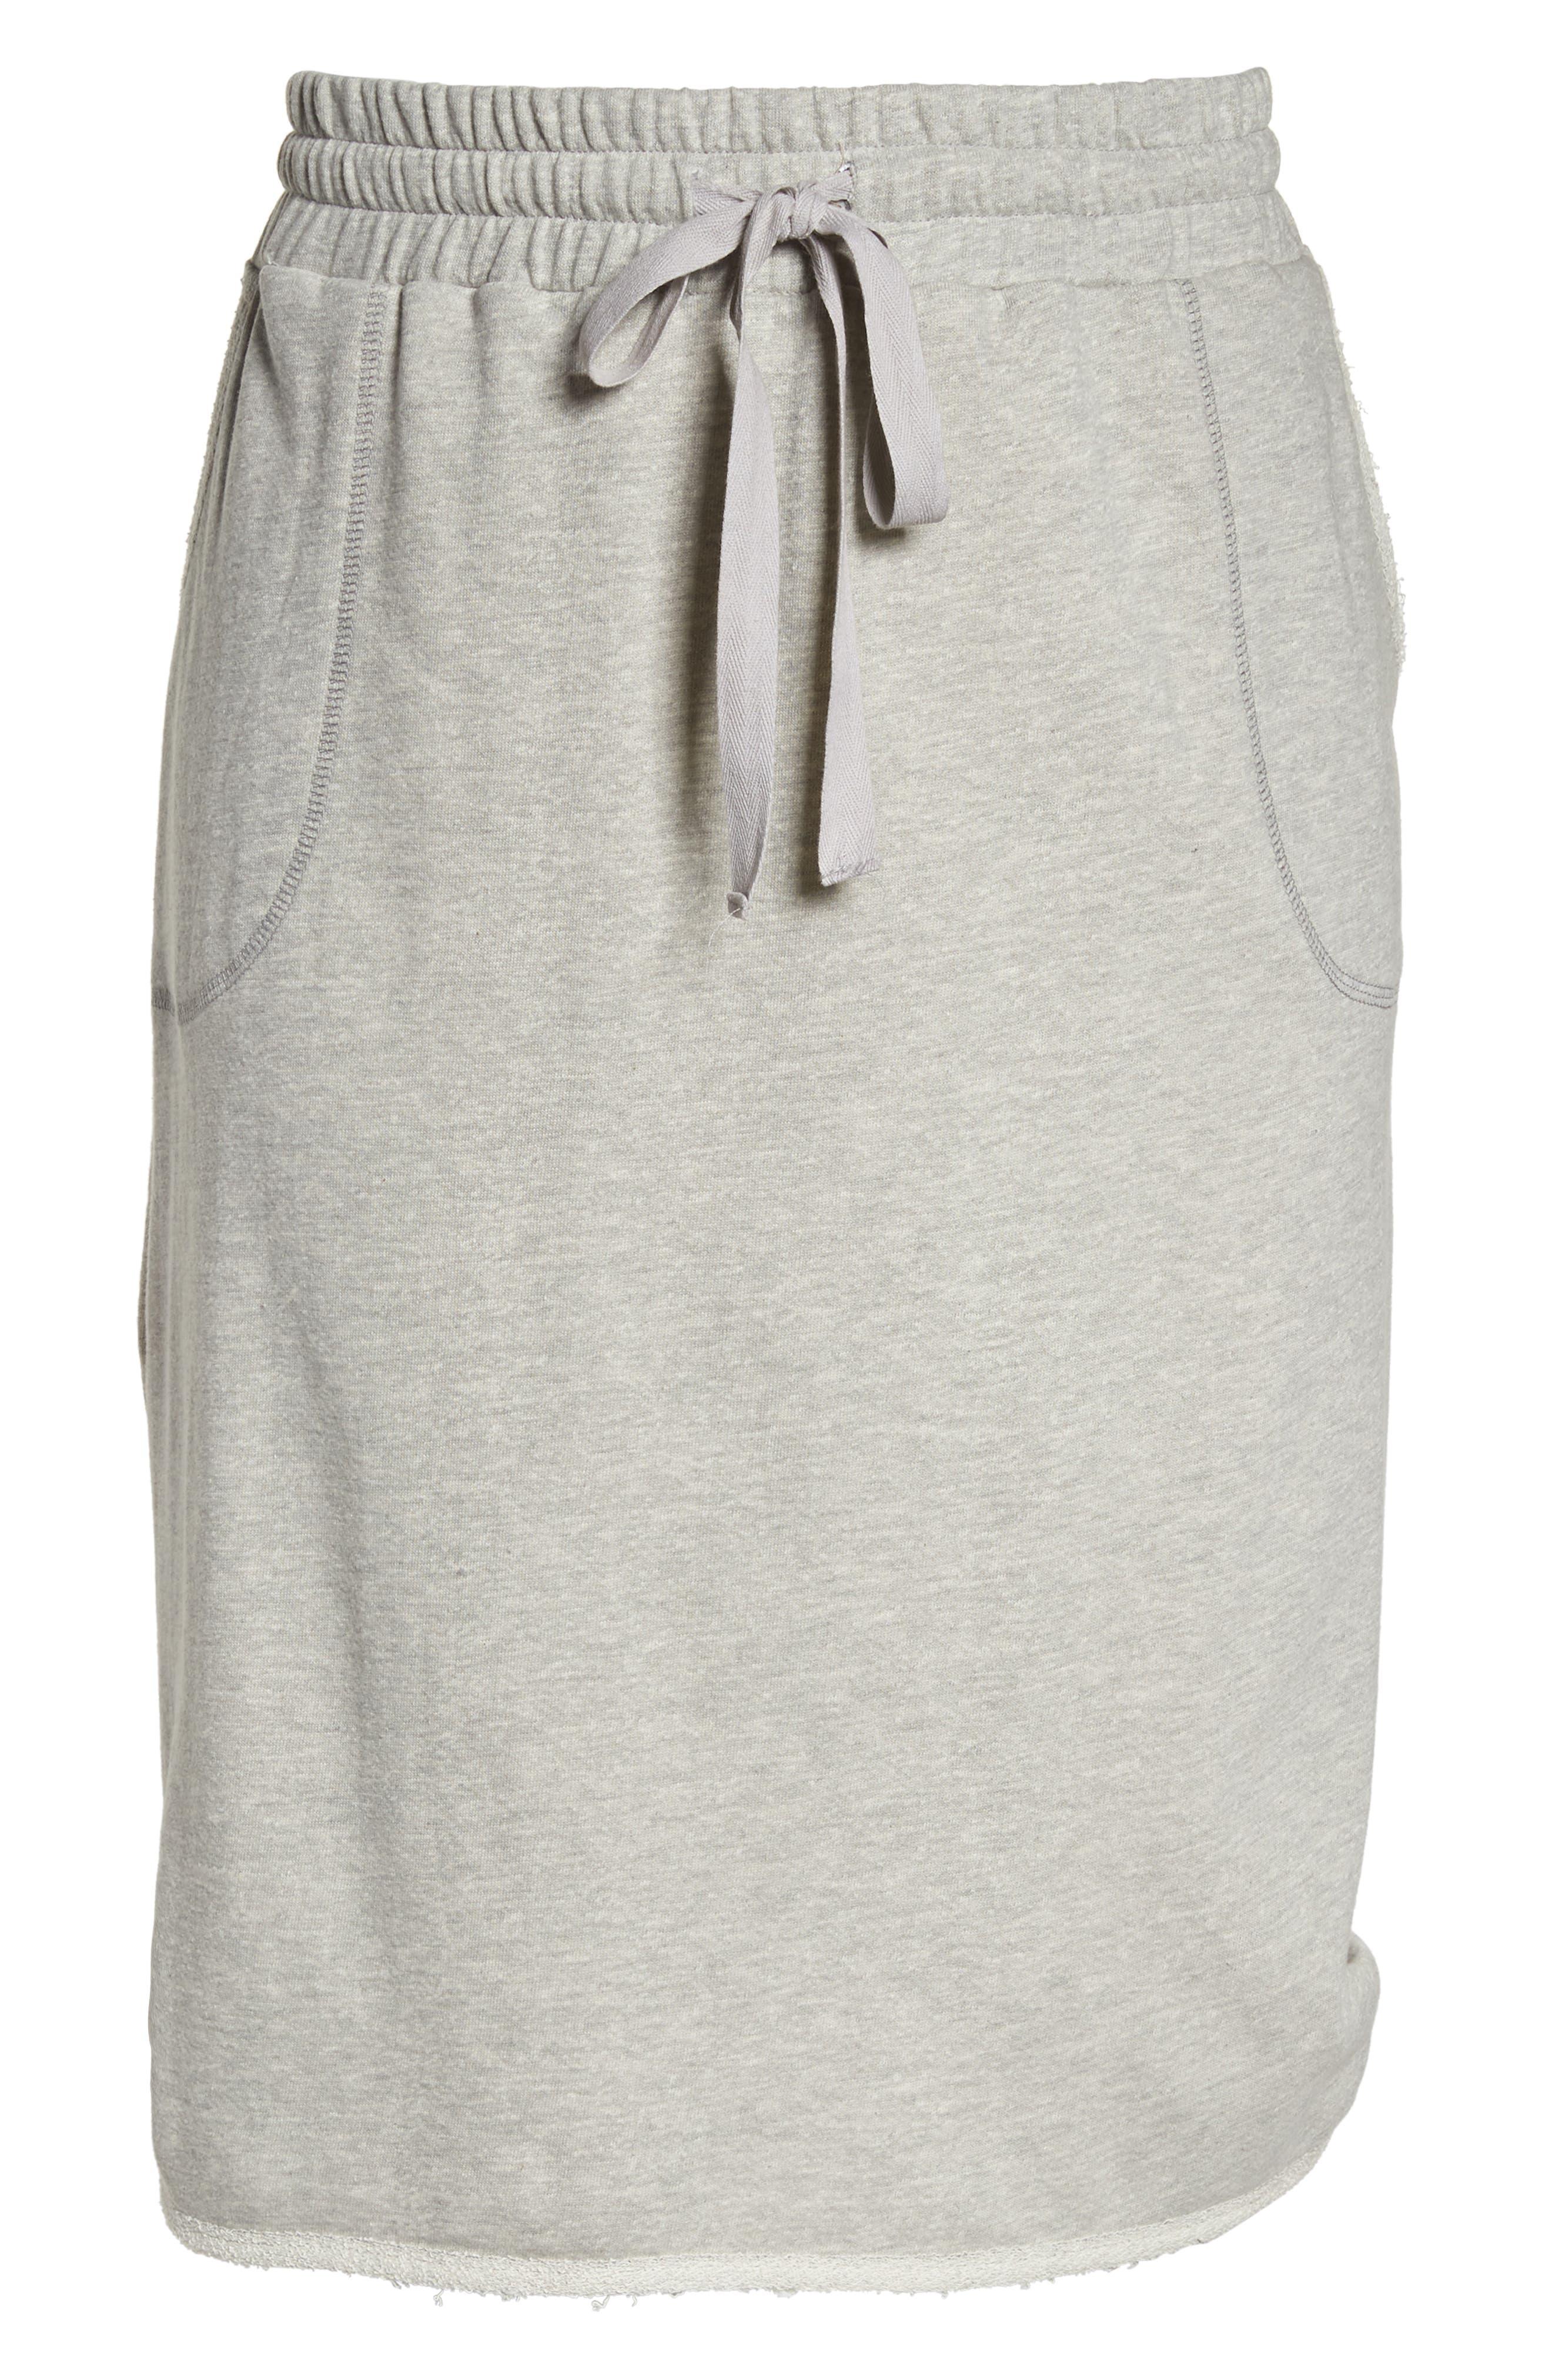 Drawstring Knit Skirt,                             Alternate thumbnail 7, color,                             Grey Heather